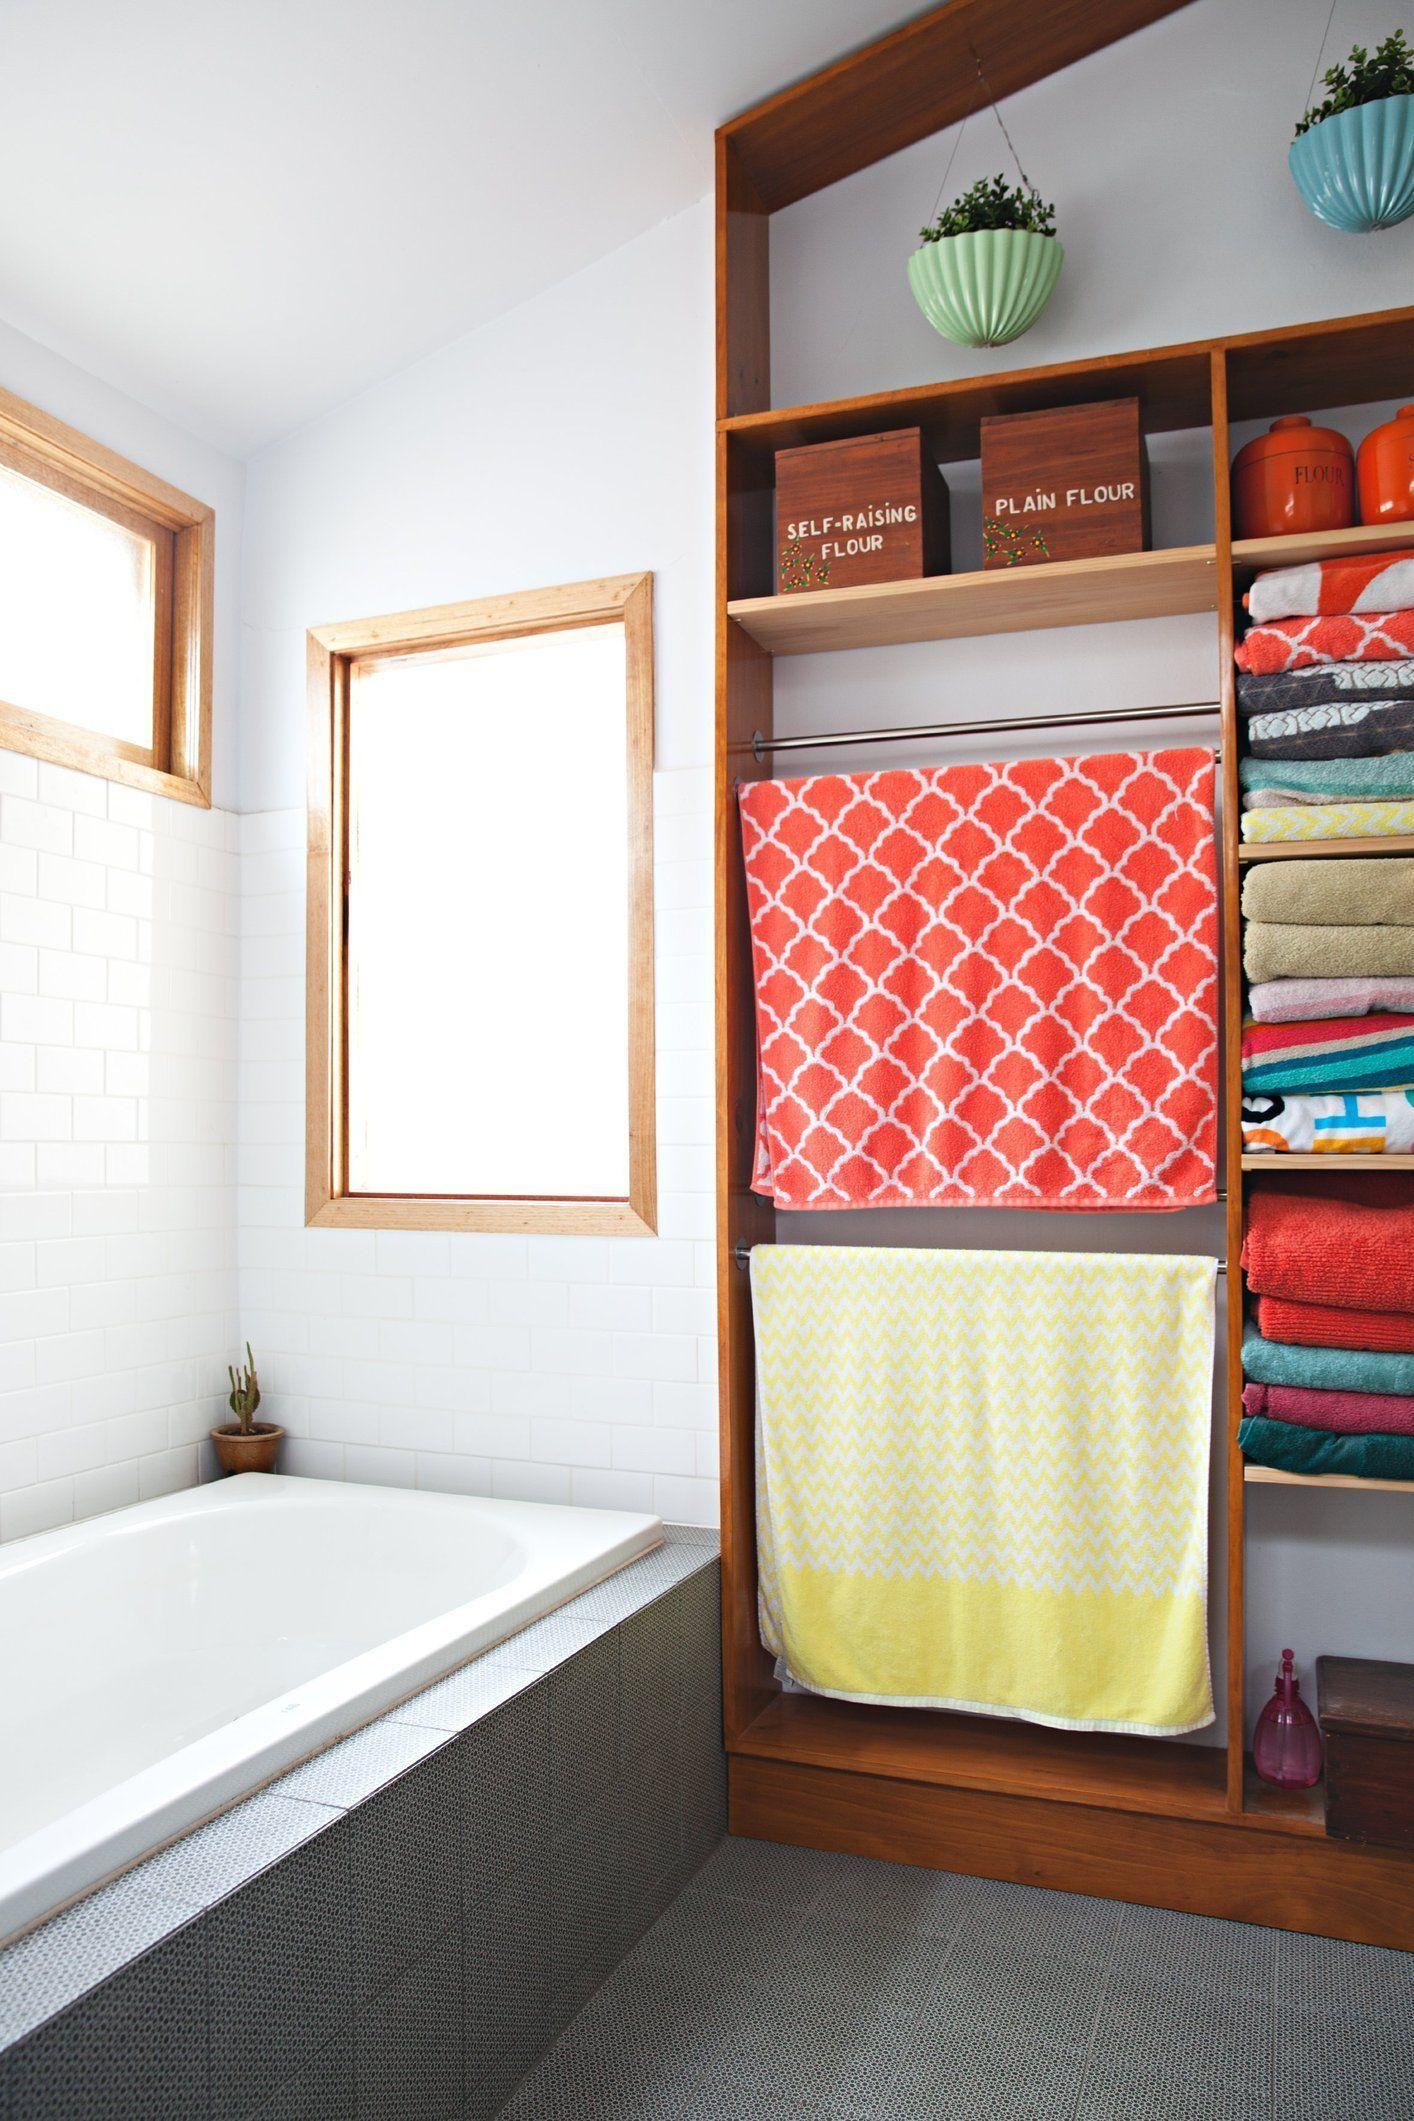 22 Ways To Boost And Refresh Your Bathroom By Adding Wood Accents: Bathroom Interior Design, Diy Bathroom Decor